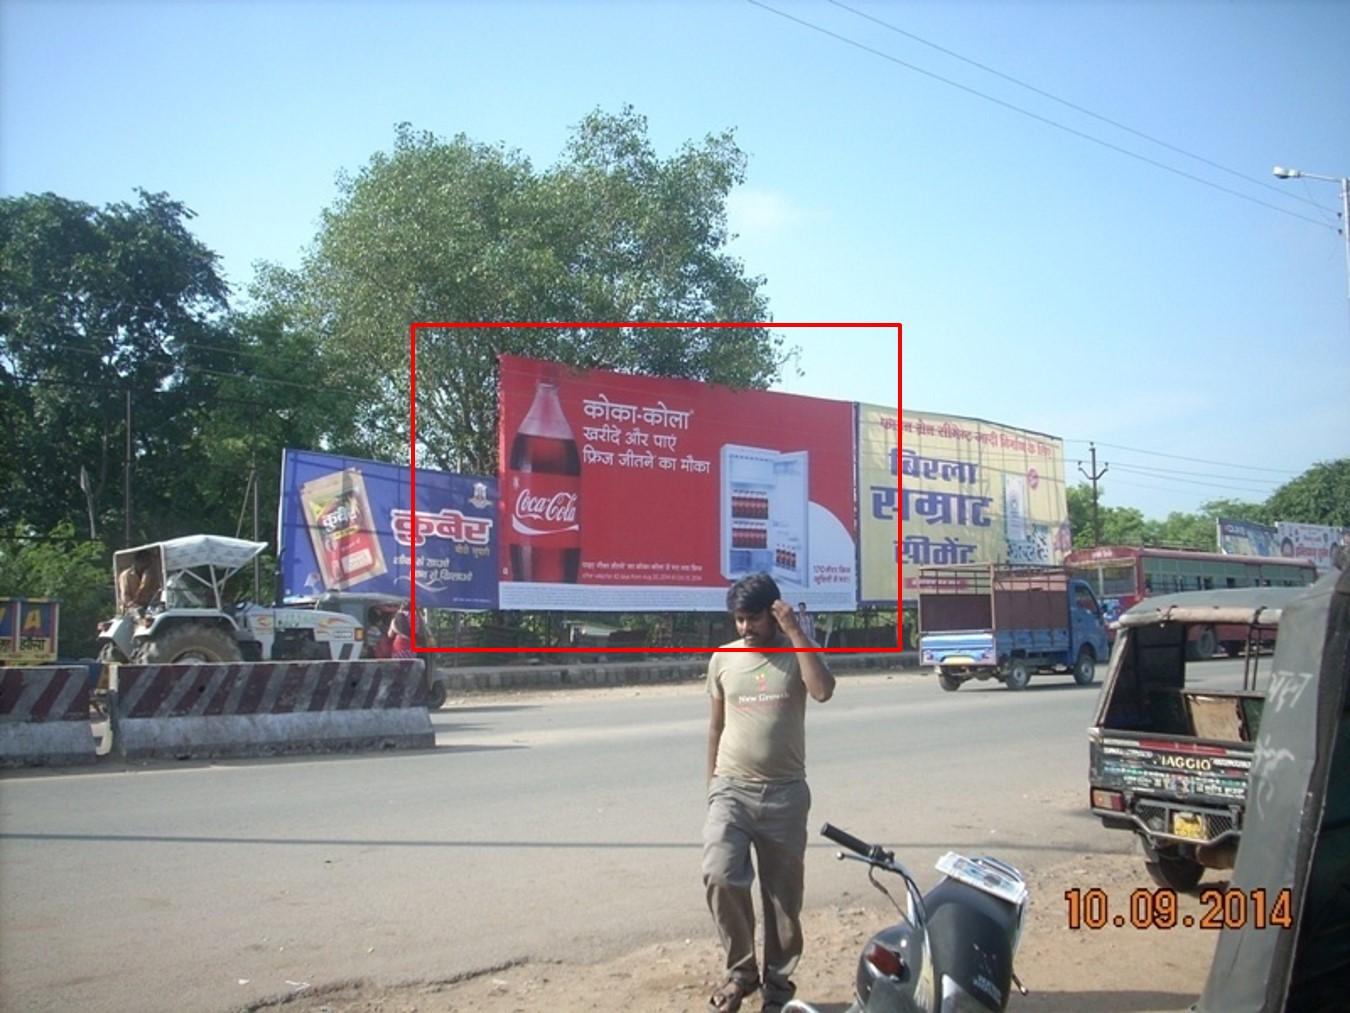 Bus Stand Opp. Vishal Mall, Jhansi